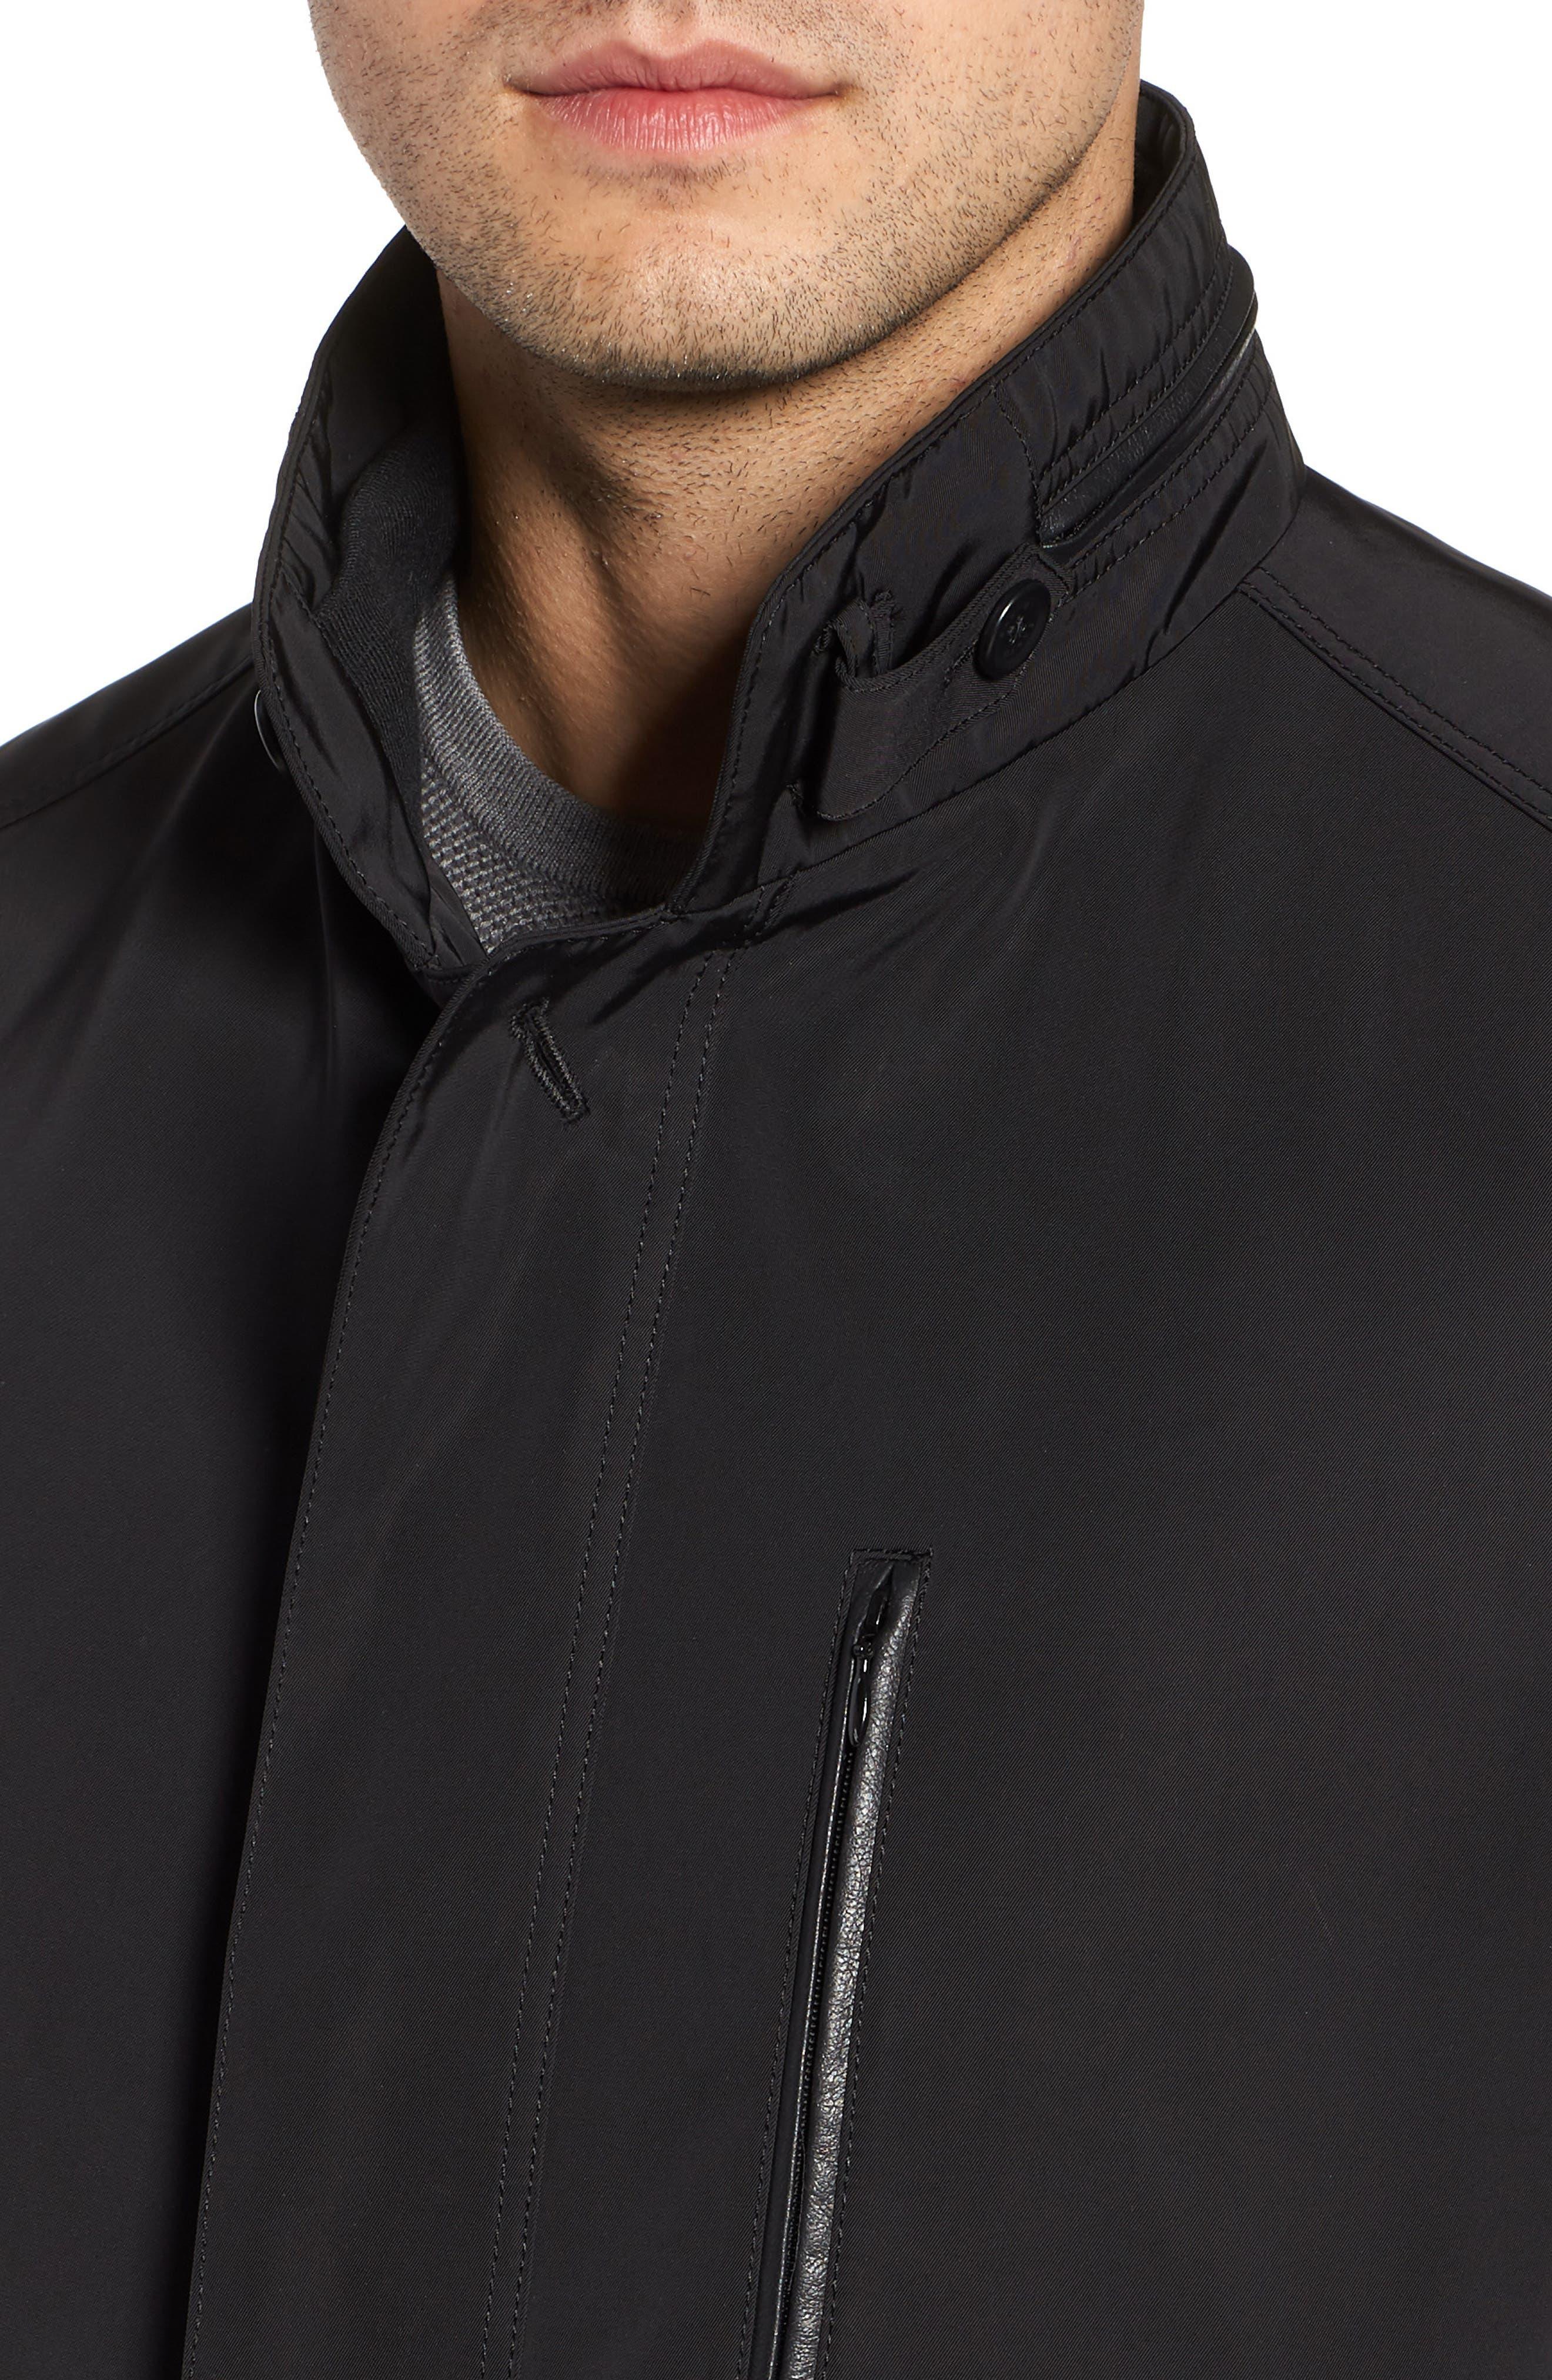 Hardy Getaway Raincoat,                             Alternate thumbnail 4, color,                             BLACK